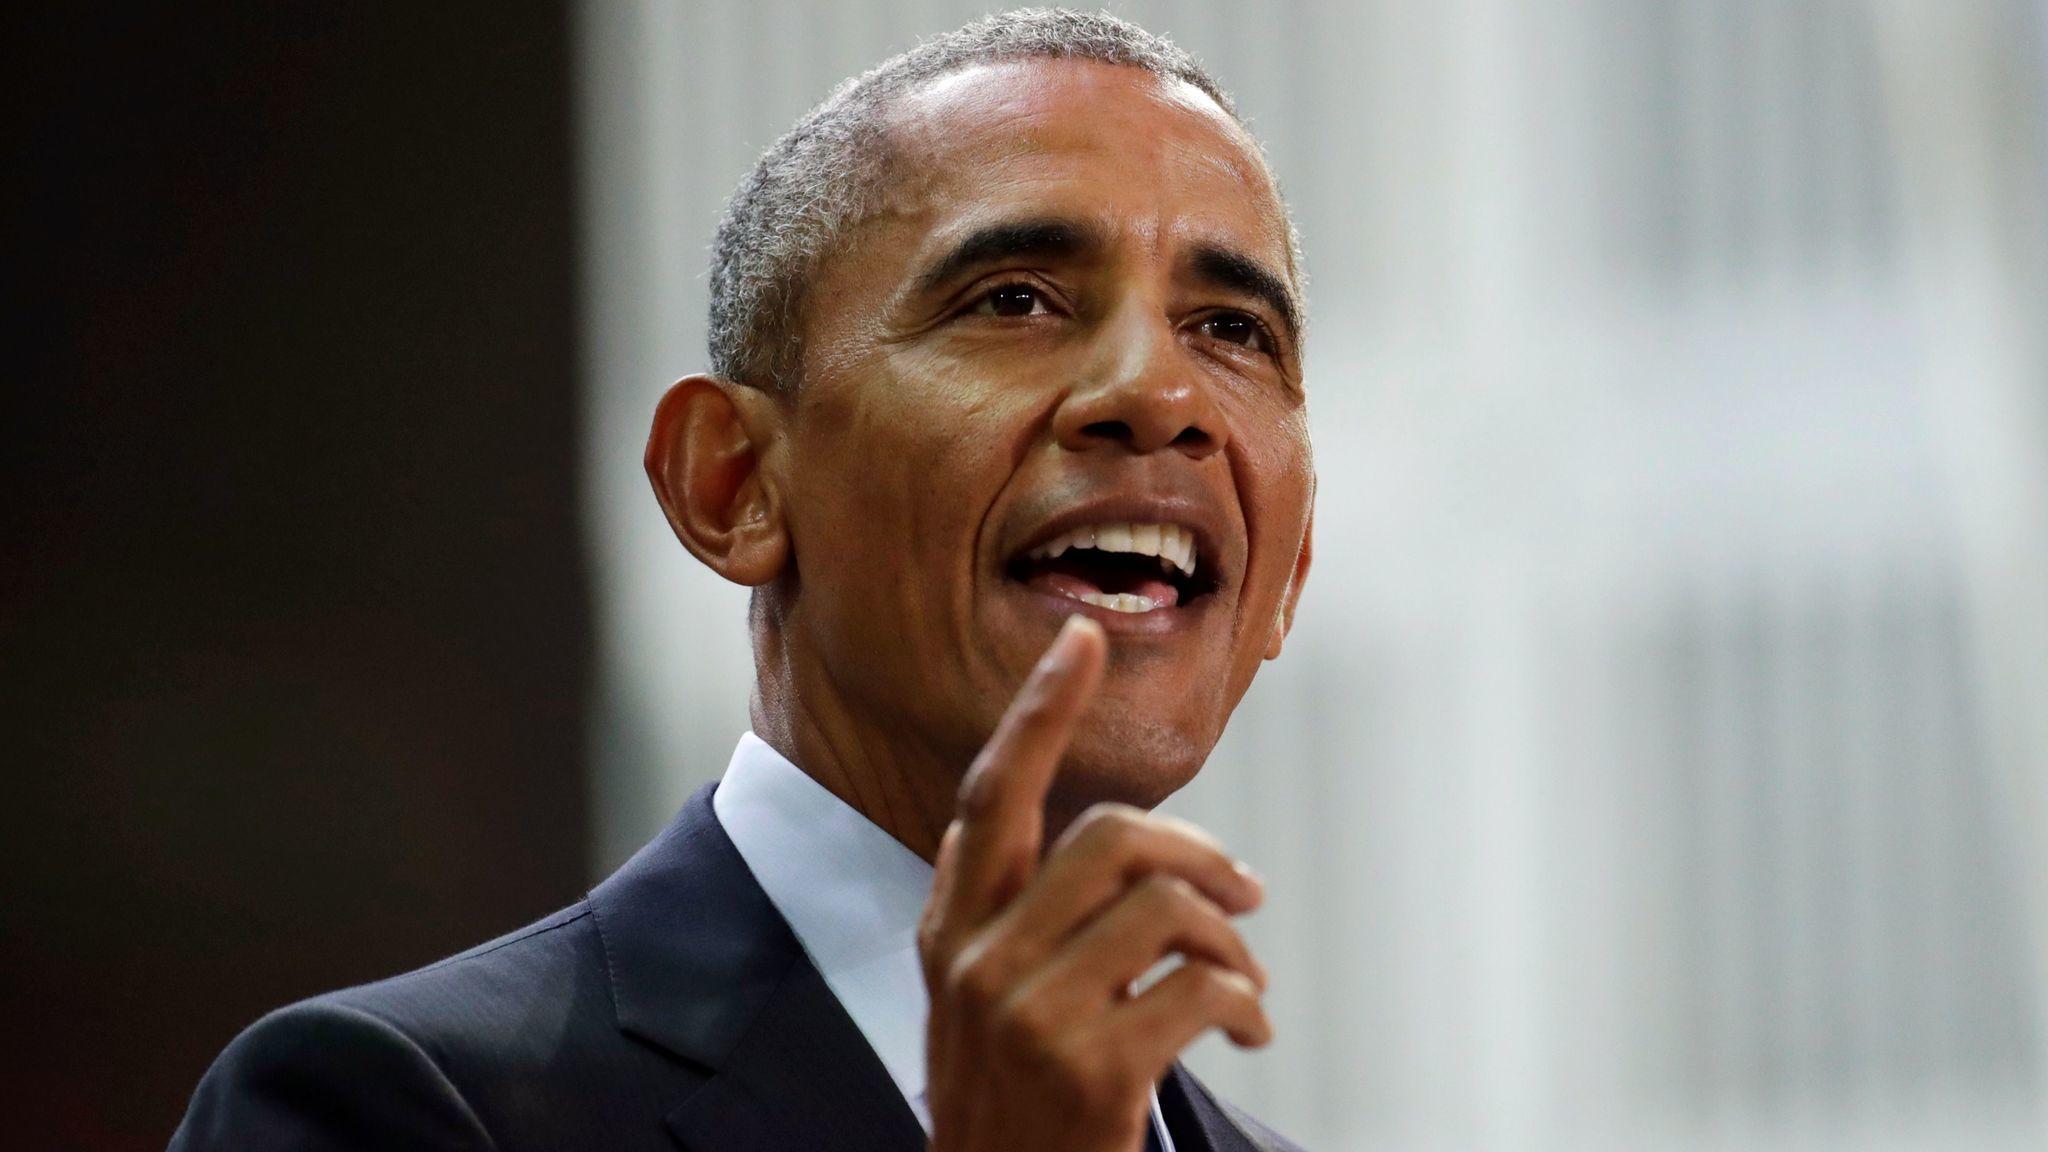 Former President Barack Obama speaks during the Goalkeepers Conference in New York on Sept. 20, 2017.